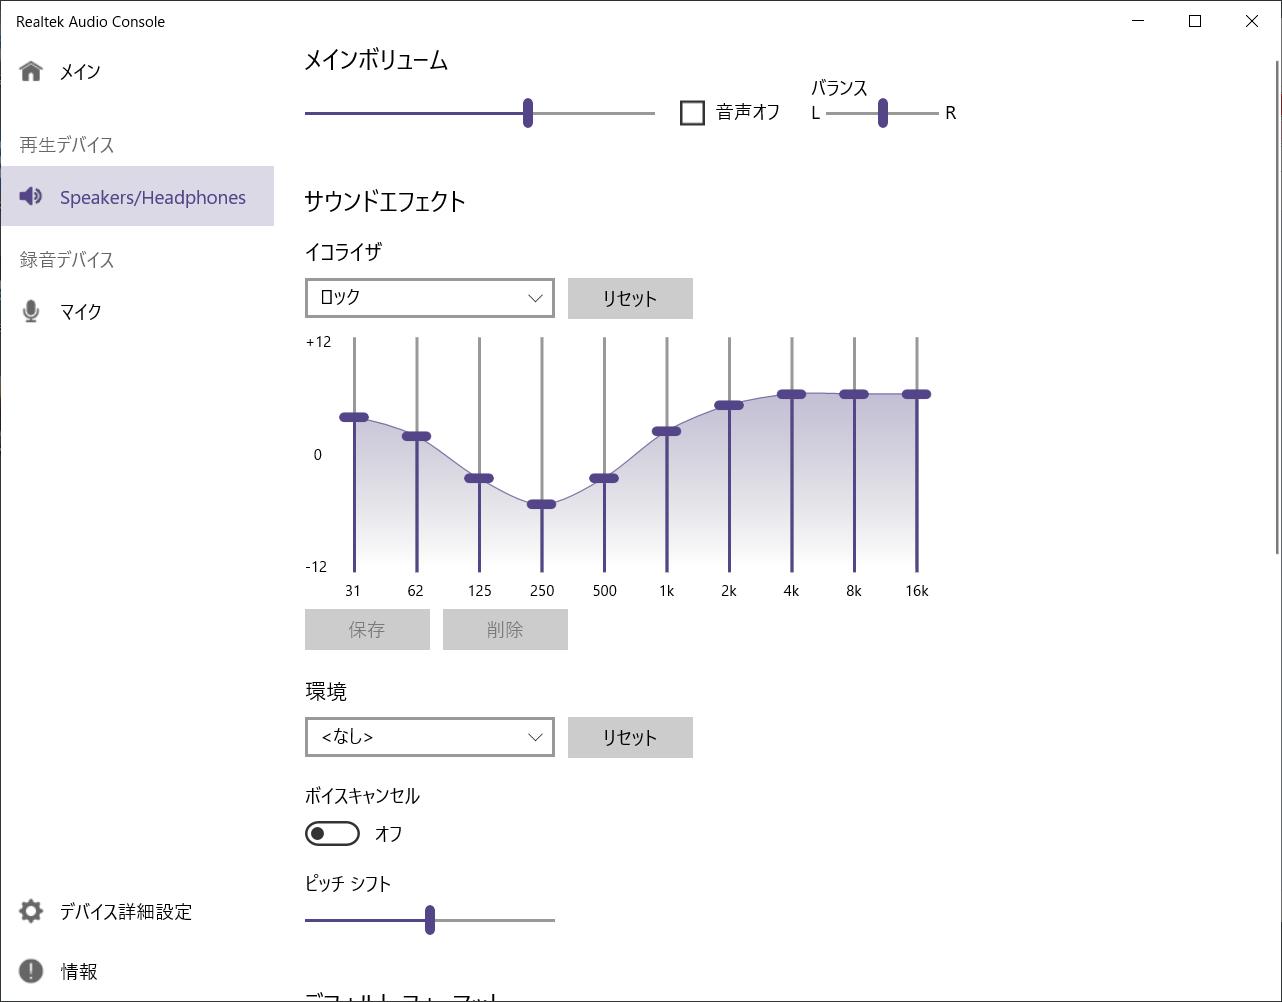 Realtek Audio Contorl